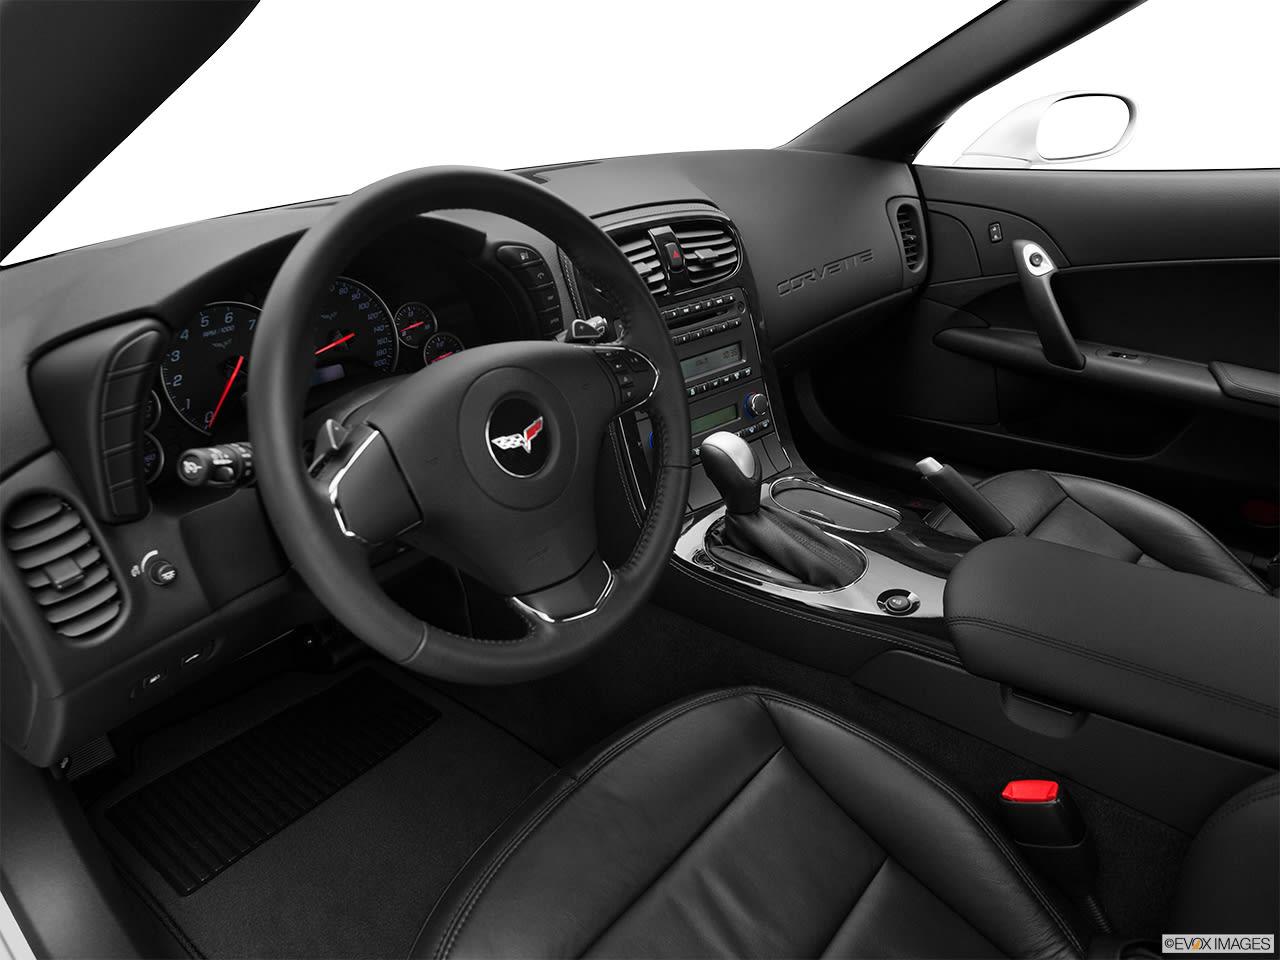 Chevrolet Corvette 2012 interior